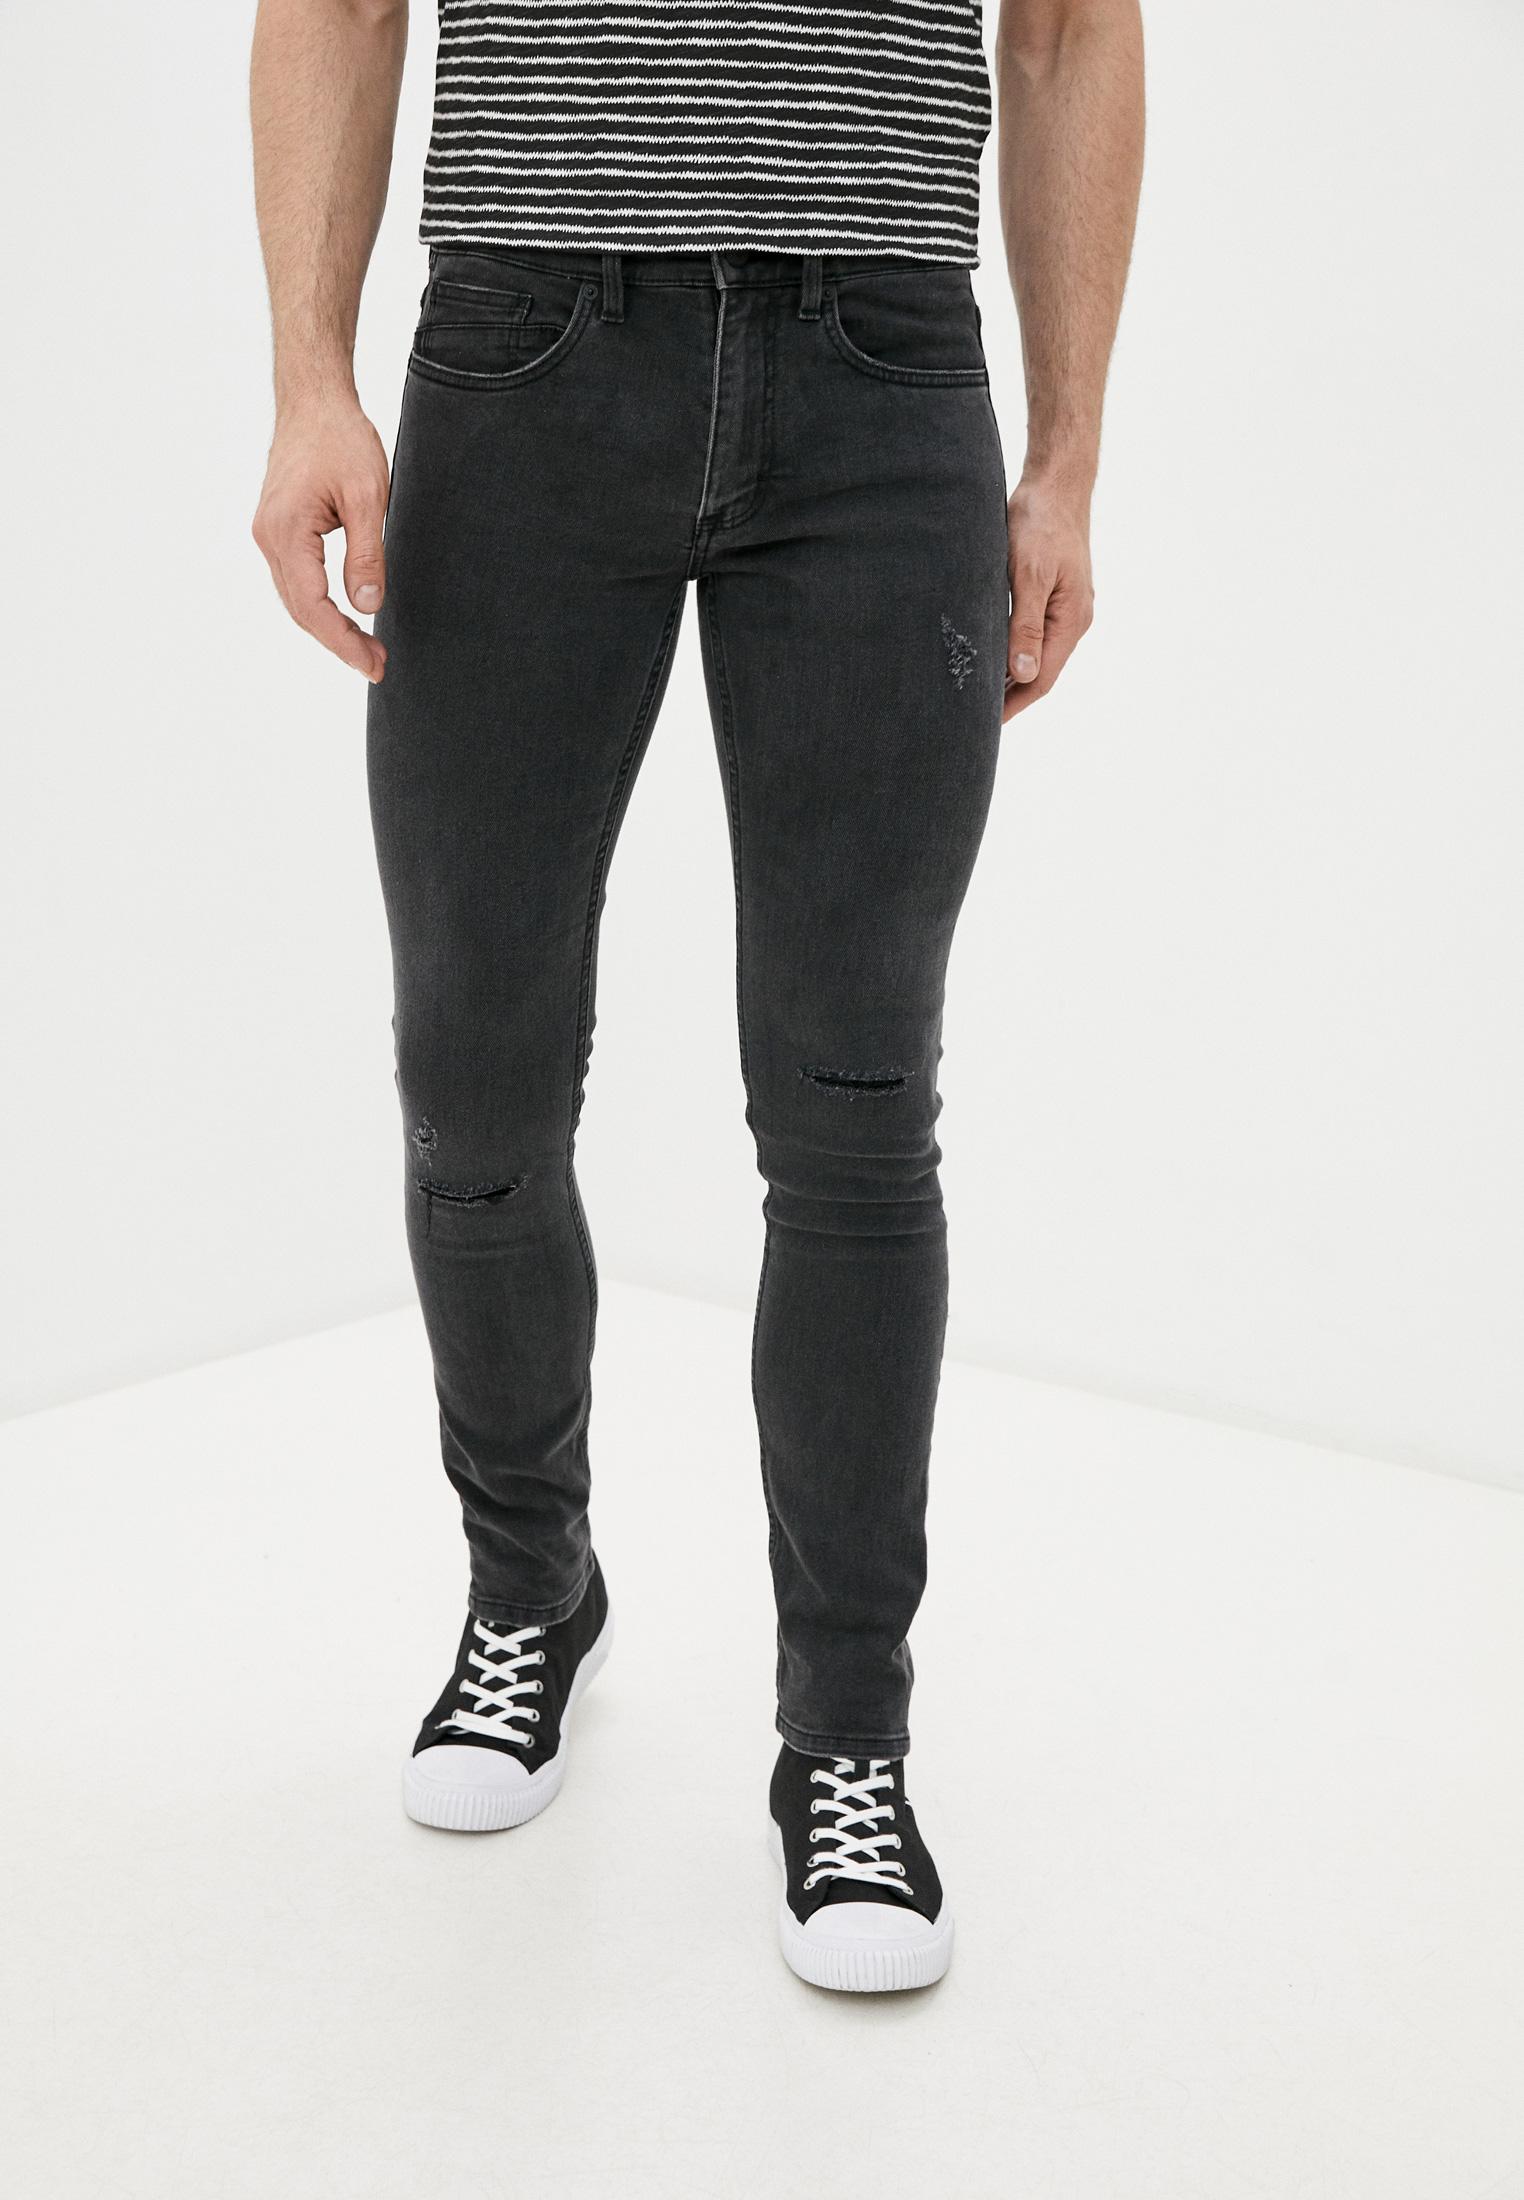 Зауженные джинсы Q/S designed by 520.10.003.26.180.2006042